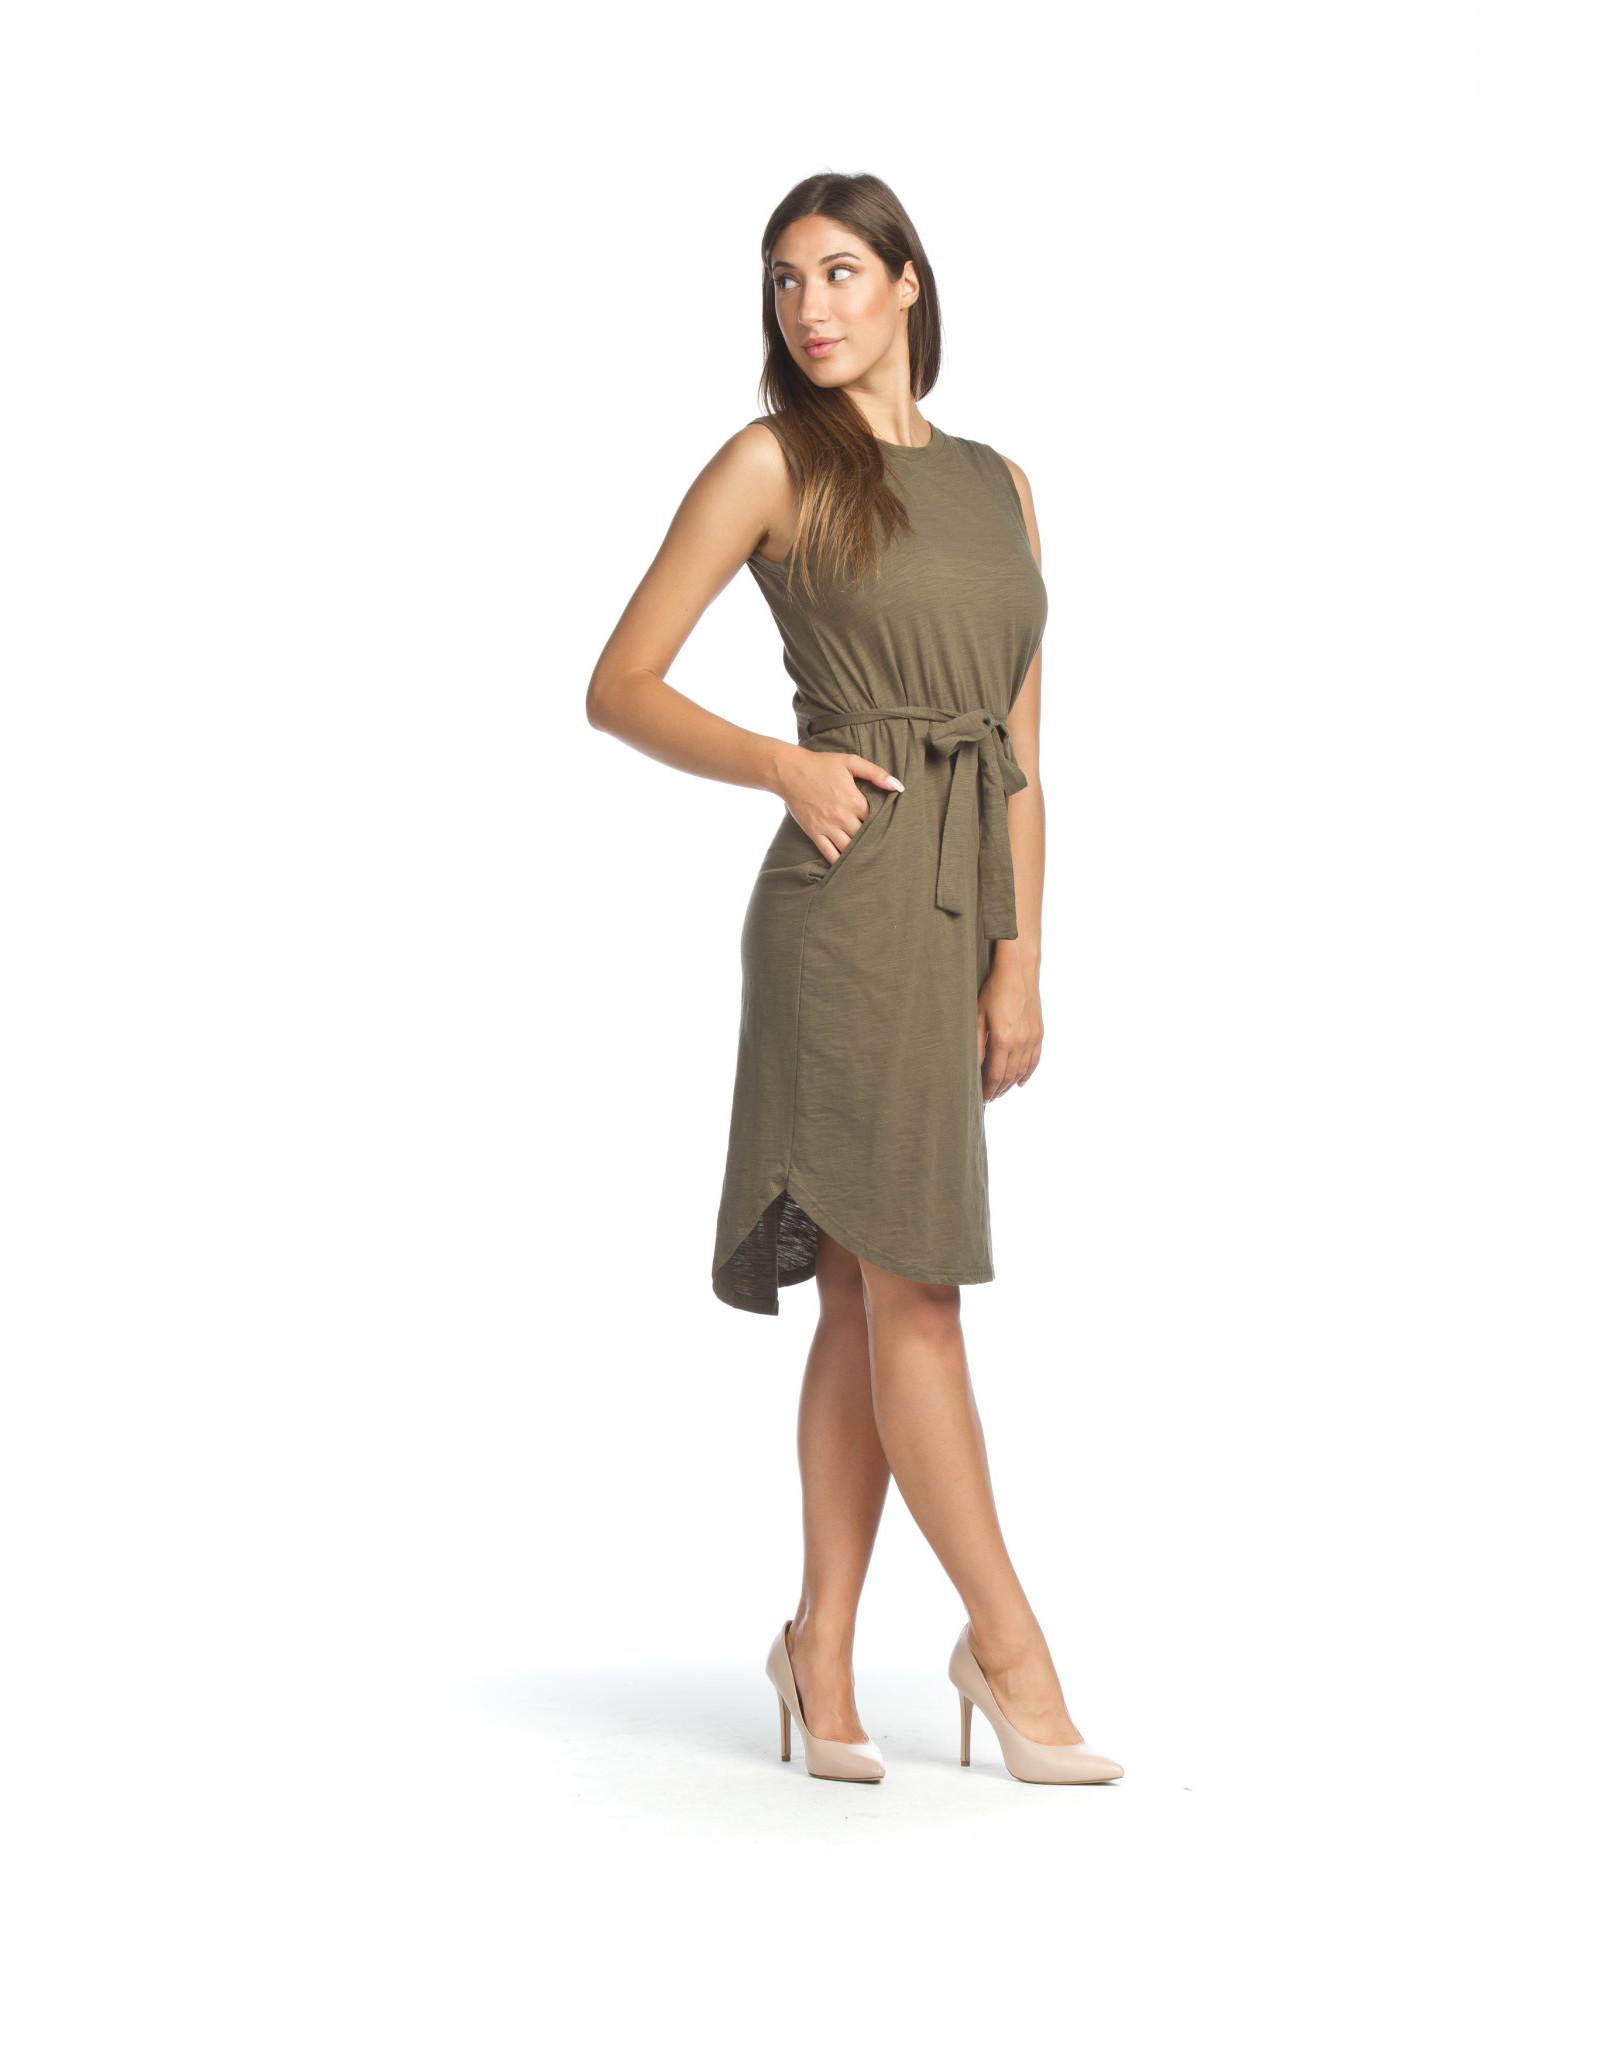 Papillon Papillon - Stretch dress with pockets